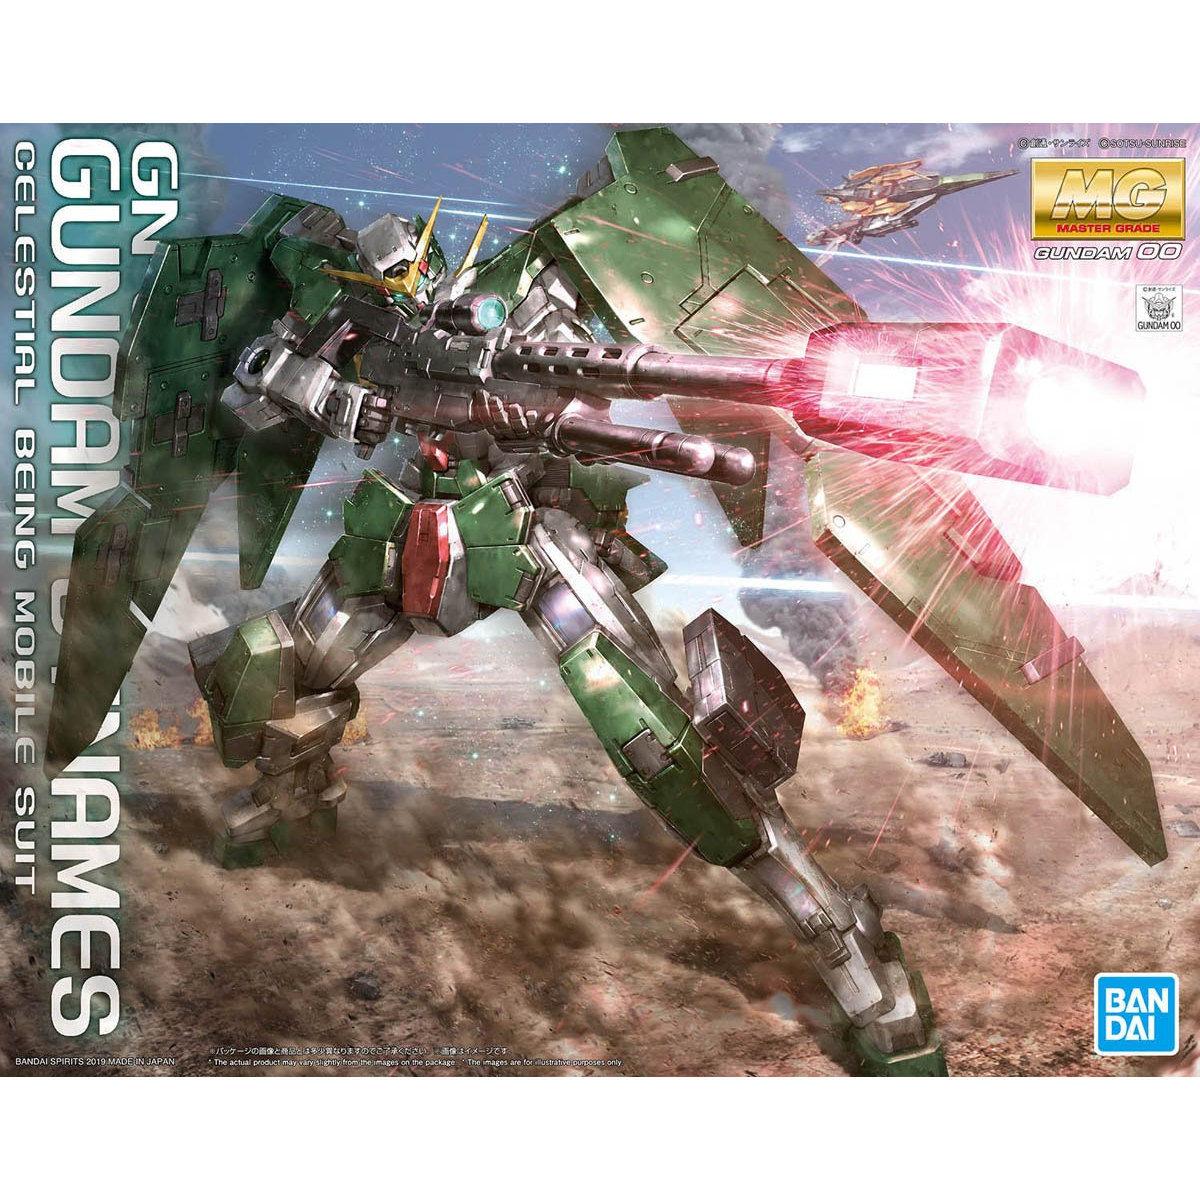 Gundam Dyname MG 1/100 Bandai